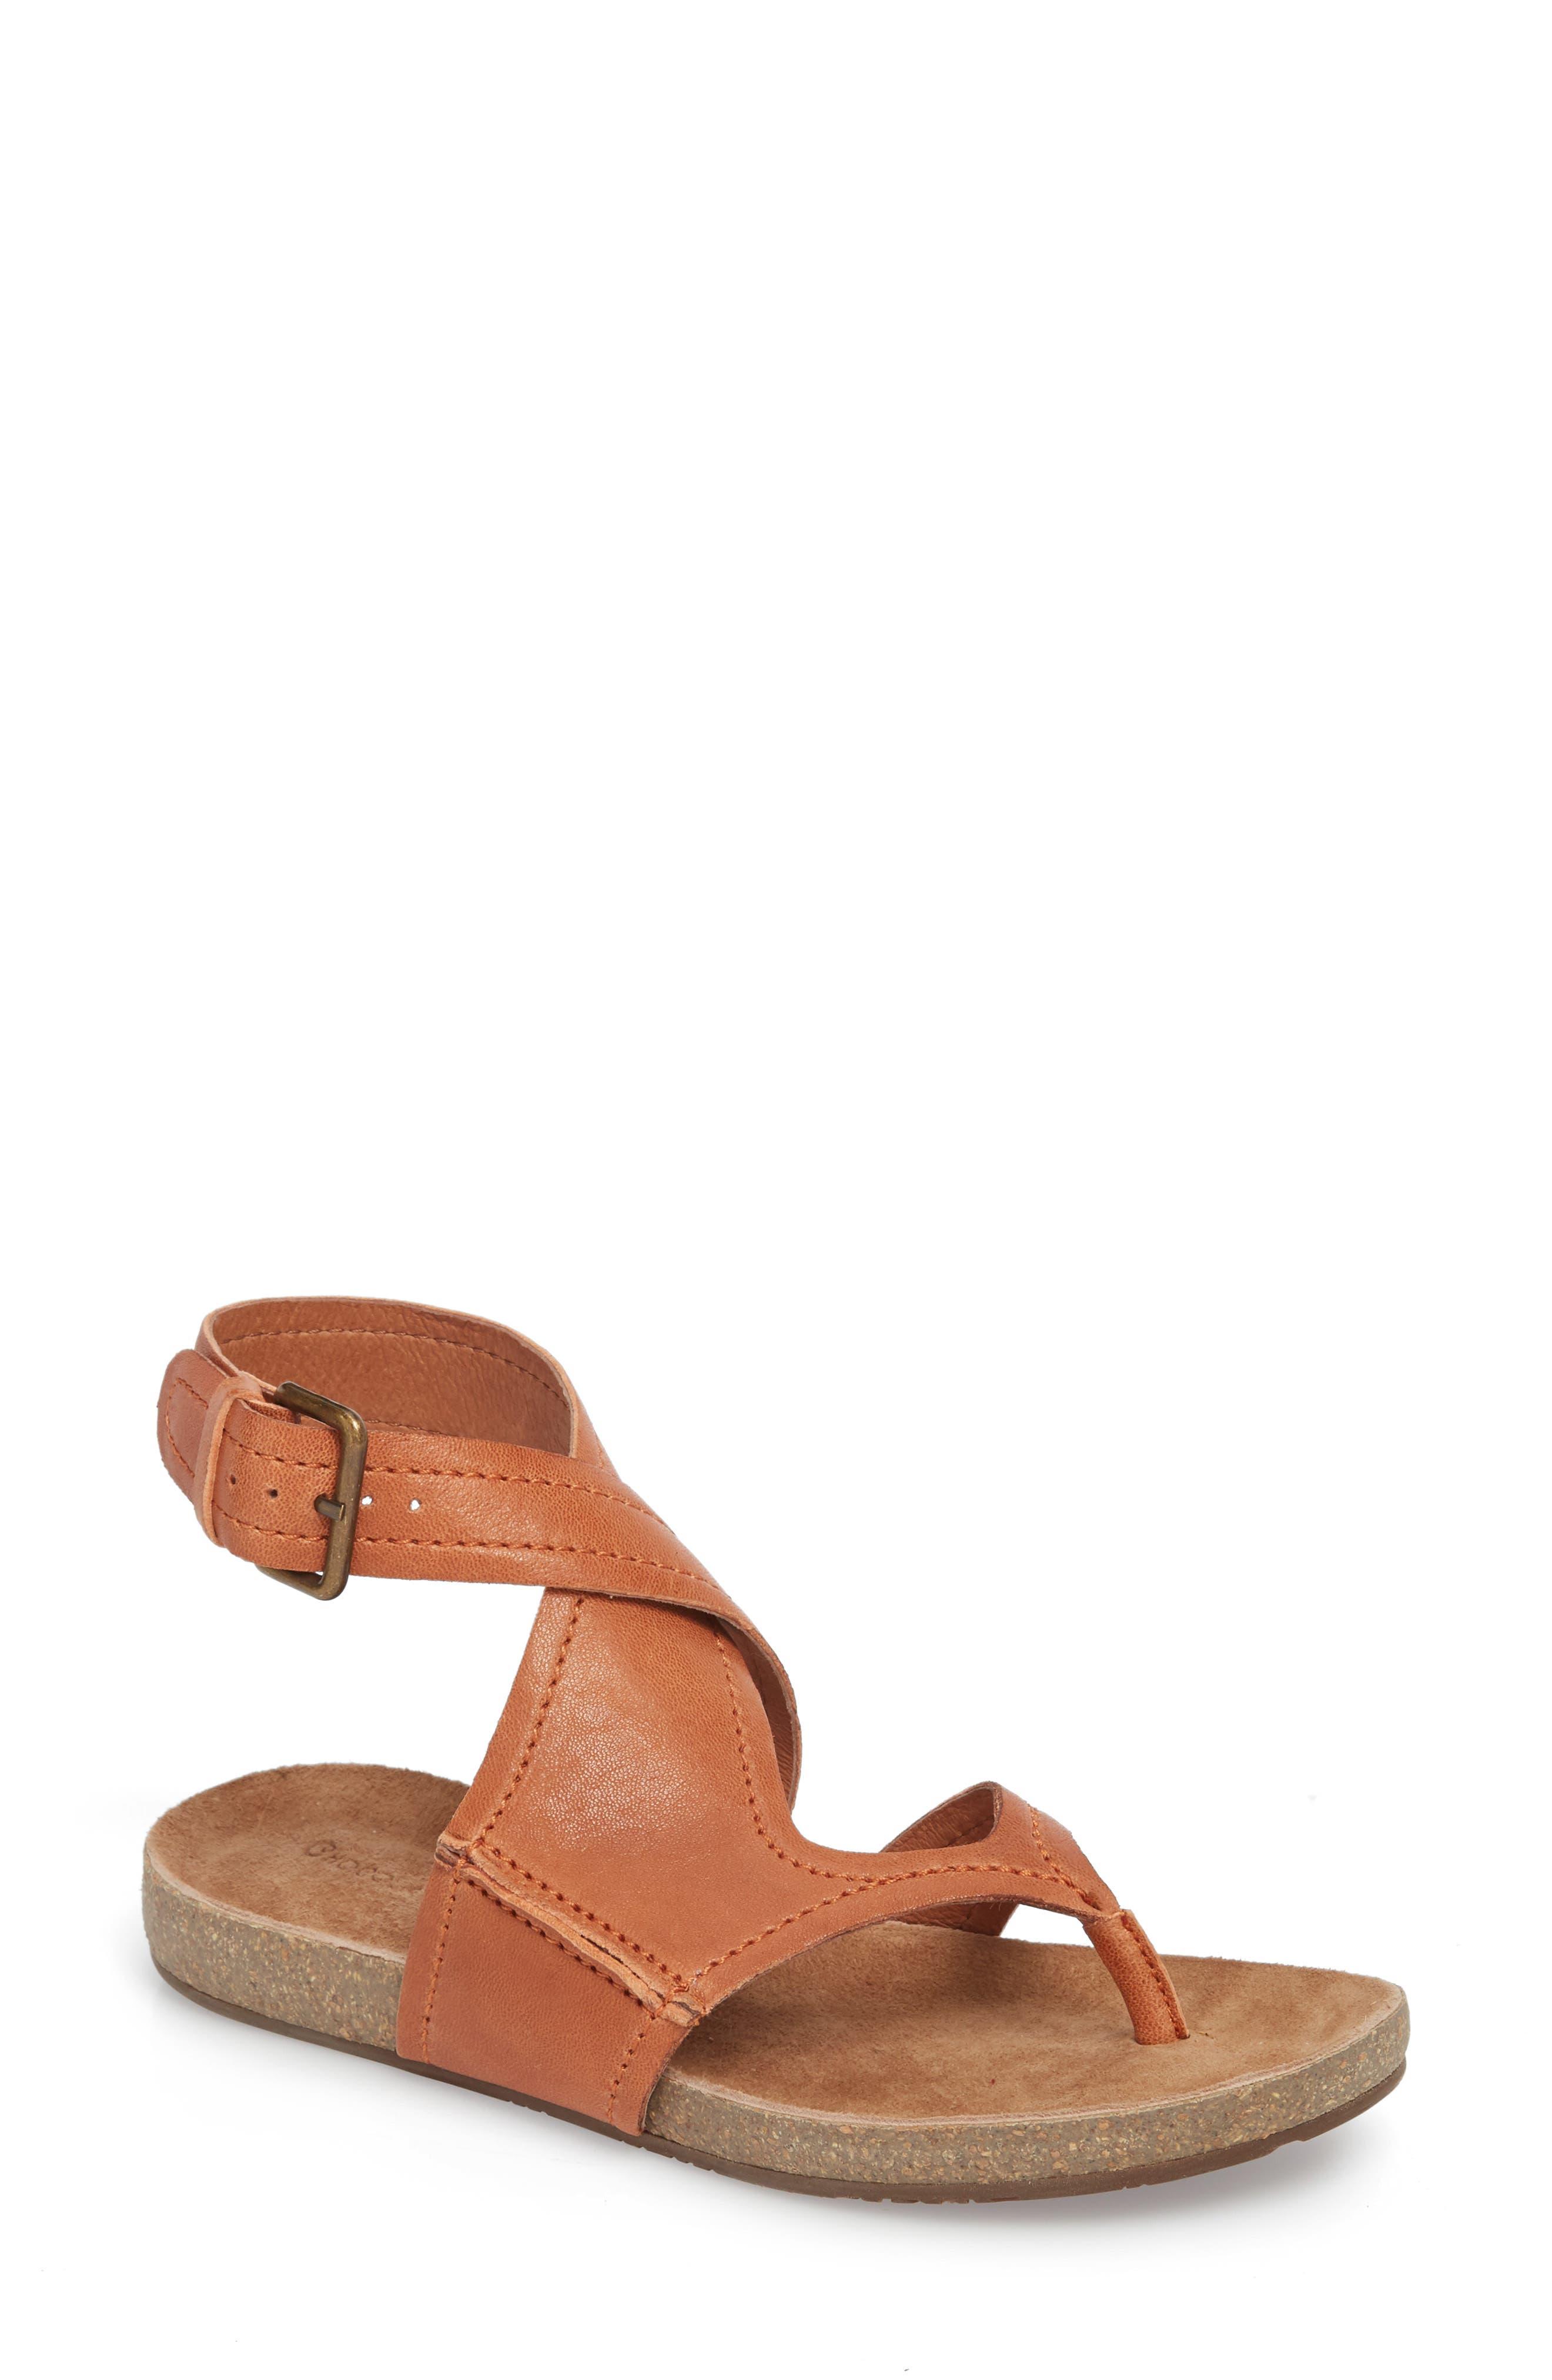 Yagger Sandal,                             Main thumbnail 1, color,                             Camel Leather